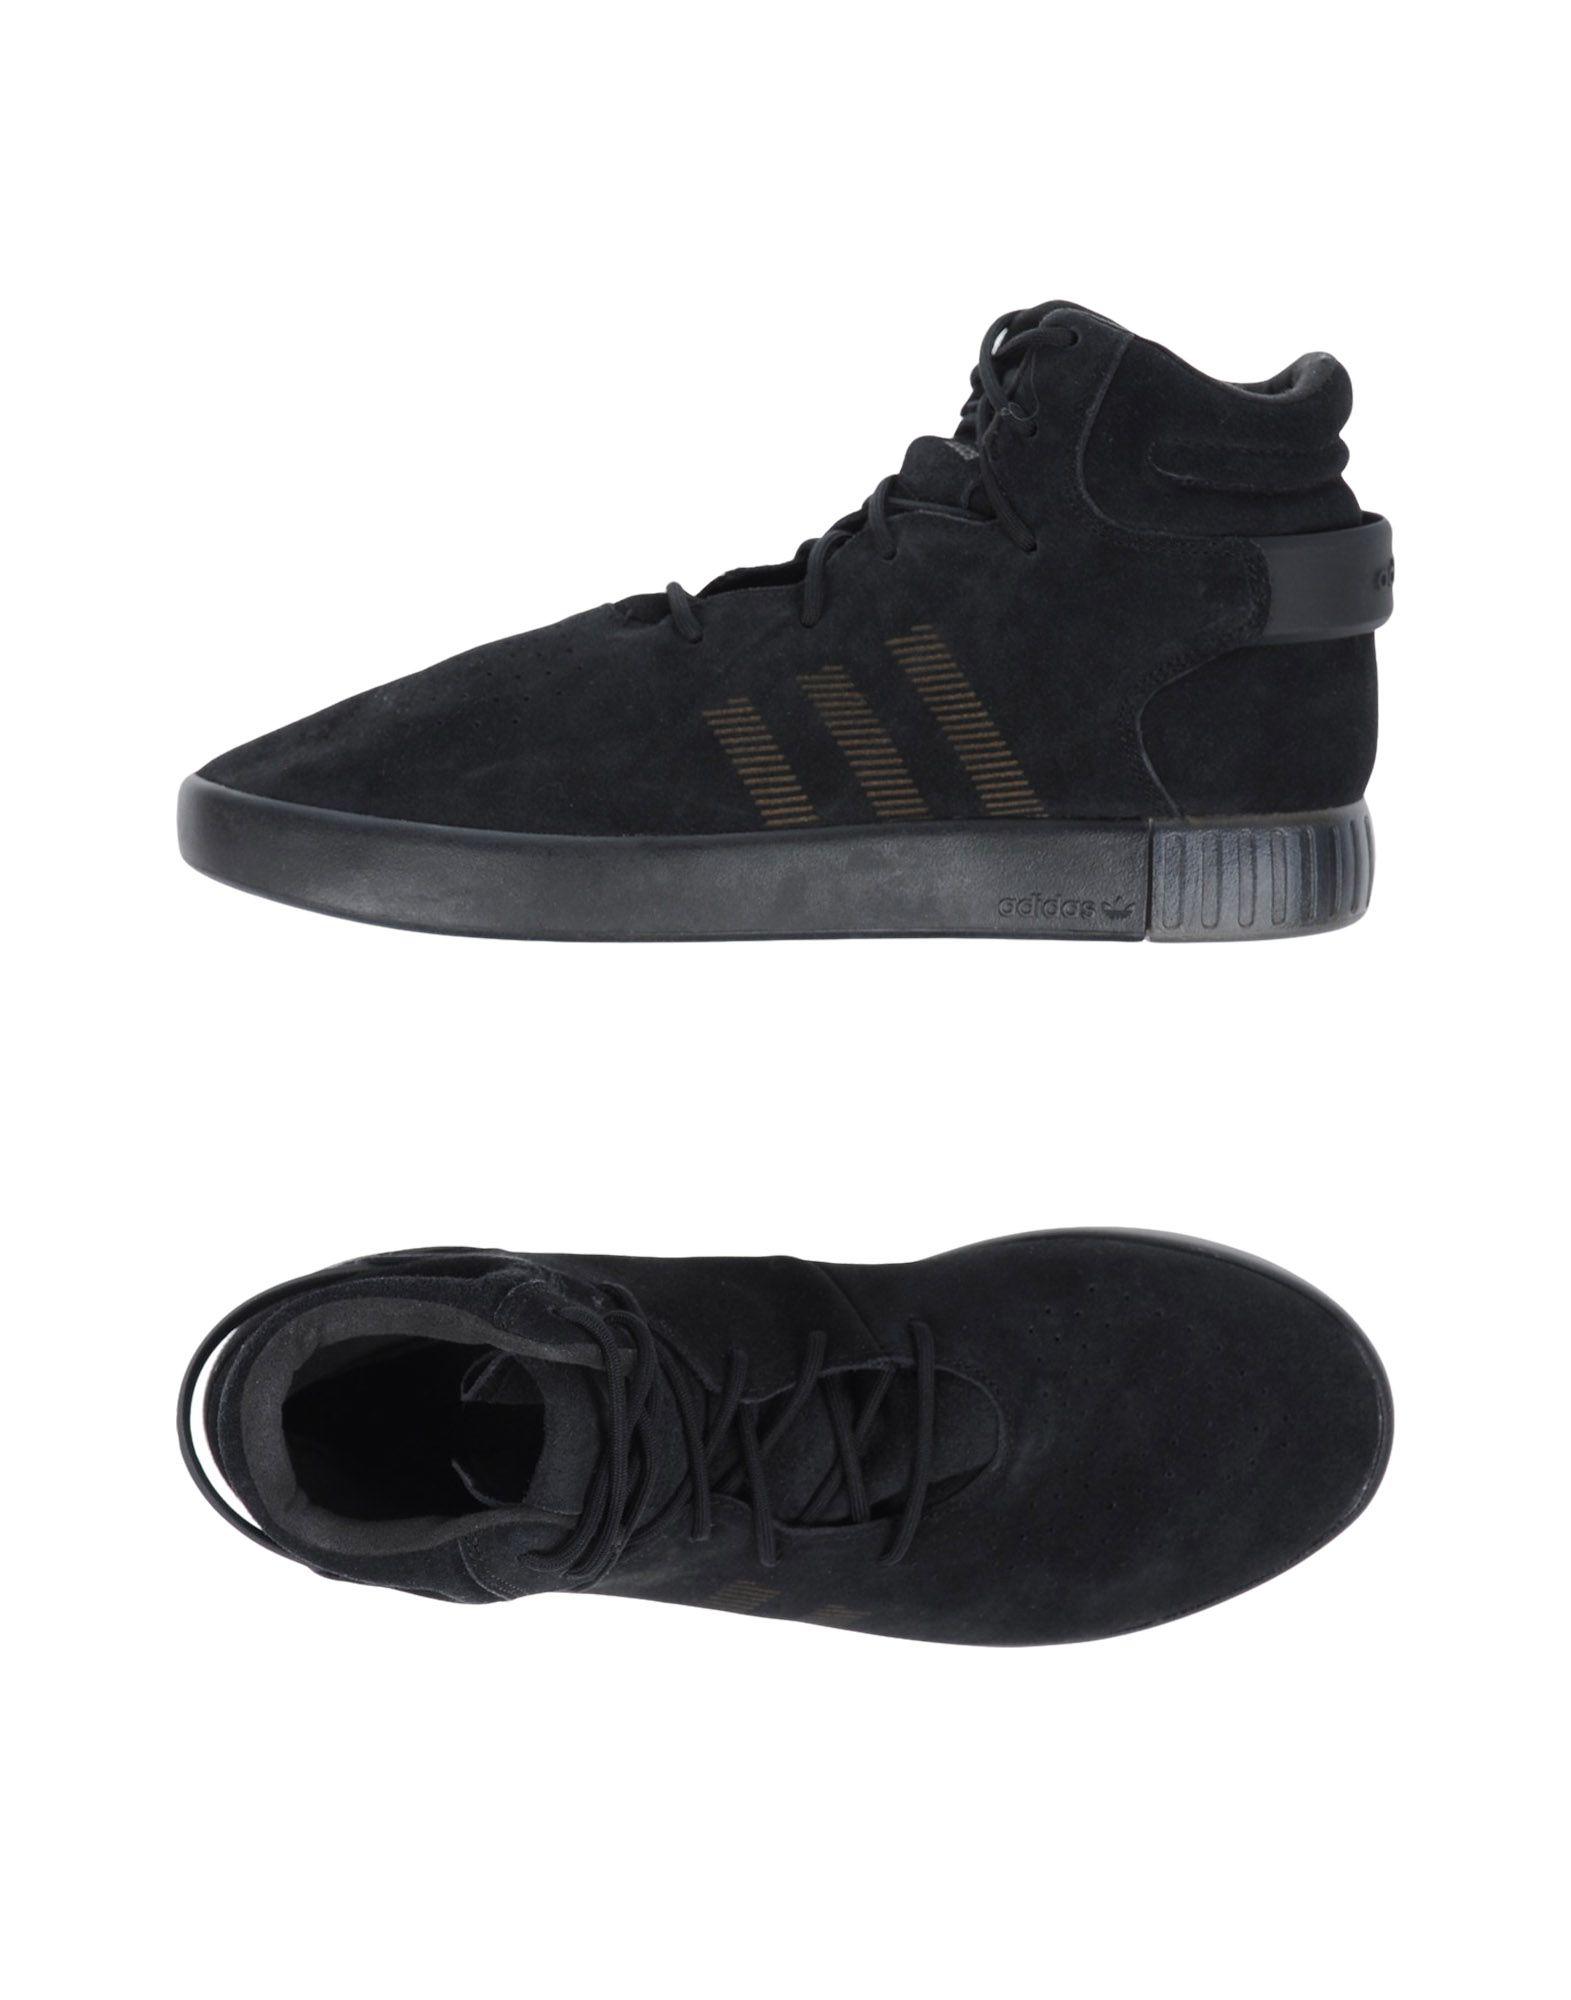 Sneakers Adidas Originals Uomo - 11266316KH 11266316KH 11266316KH 487341